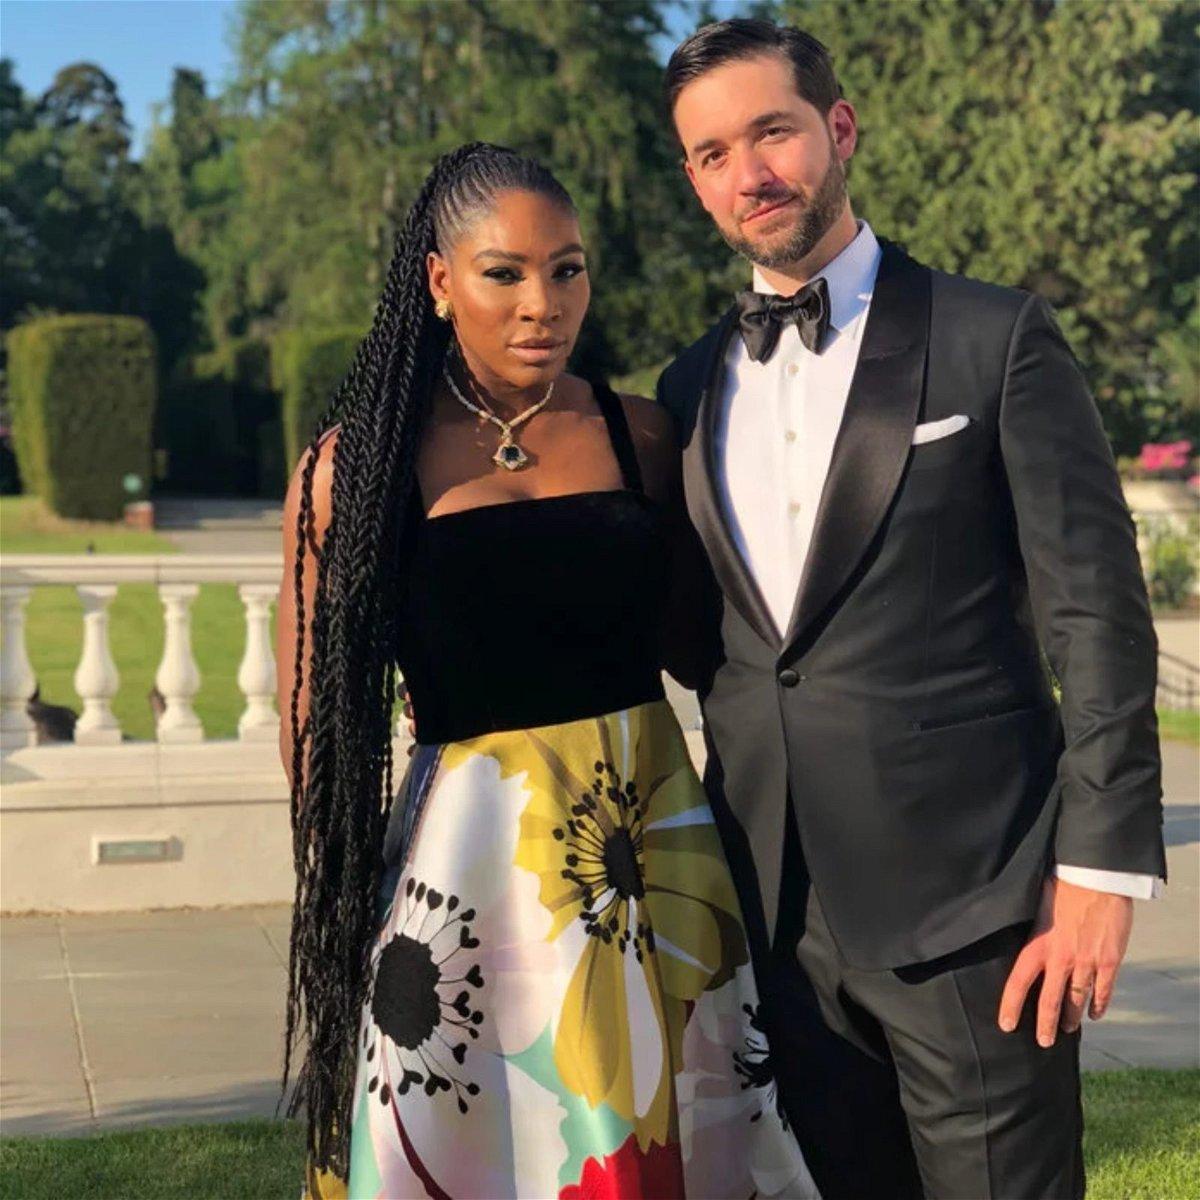 Serena Williams Husband Turns Coronavirus Challenge Into